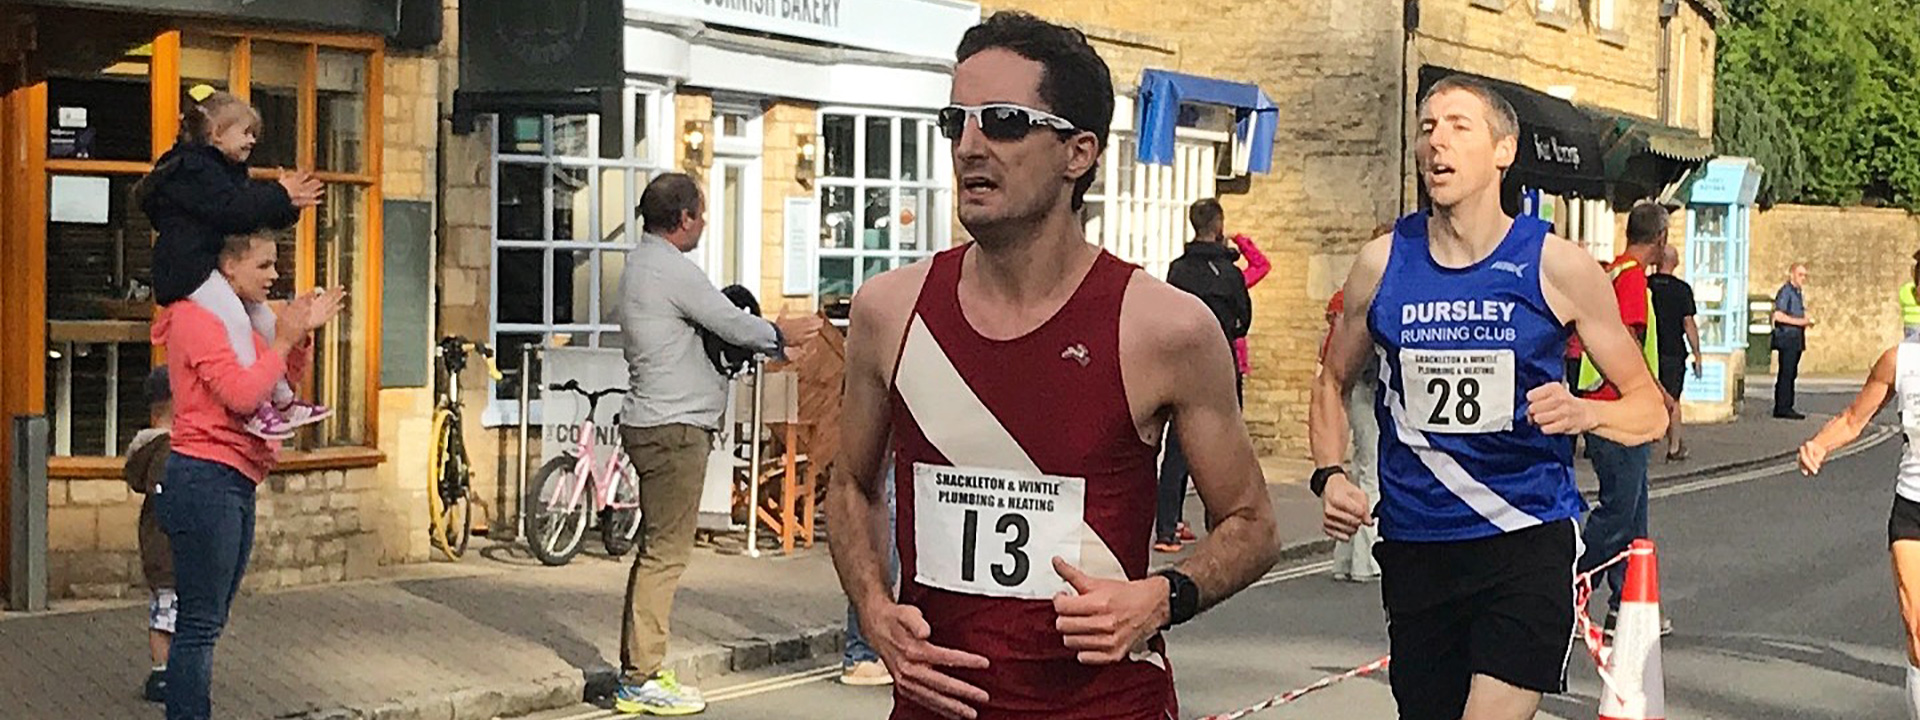 Bourton One Mile Challenge